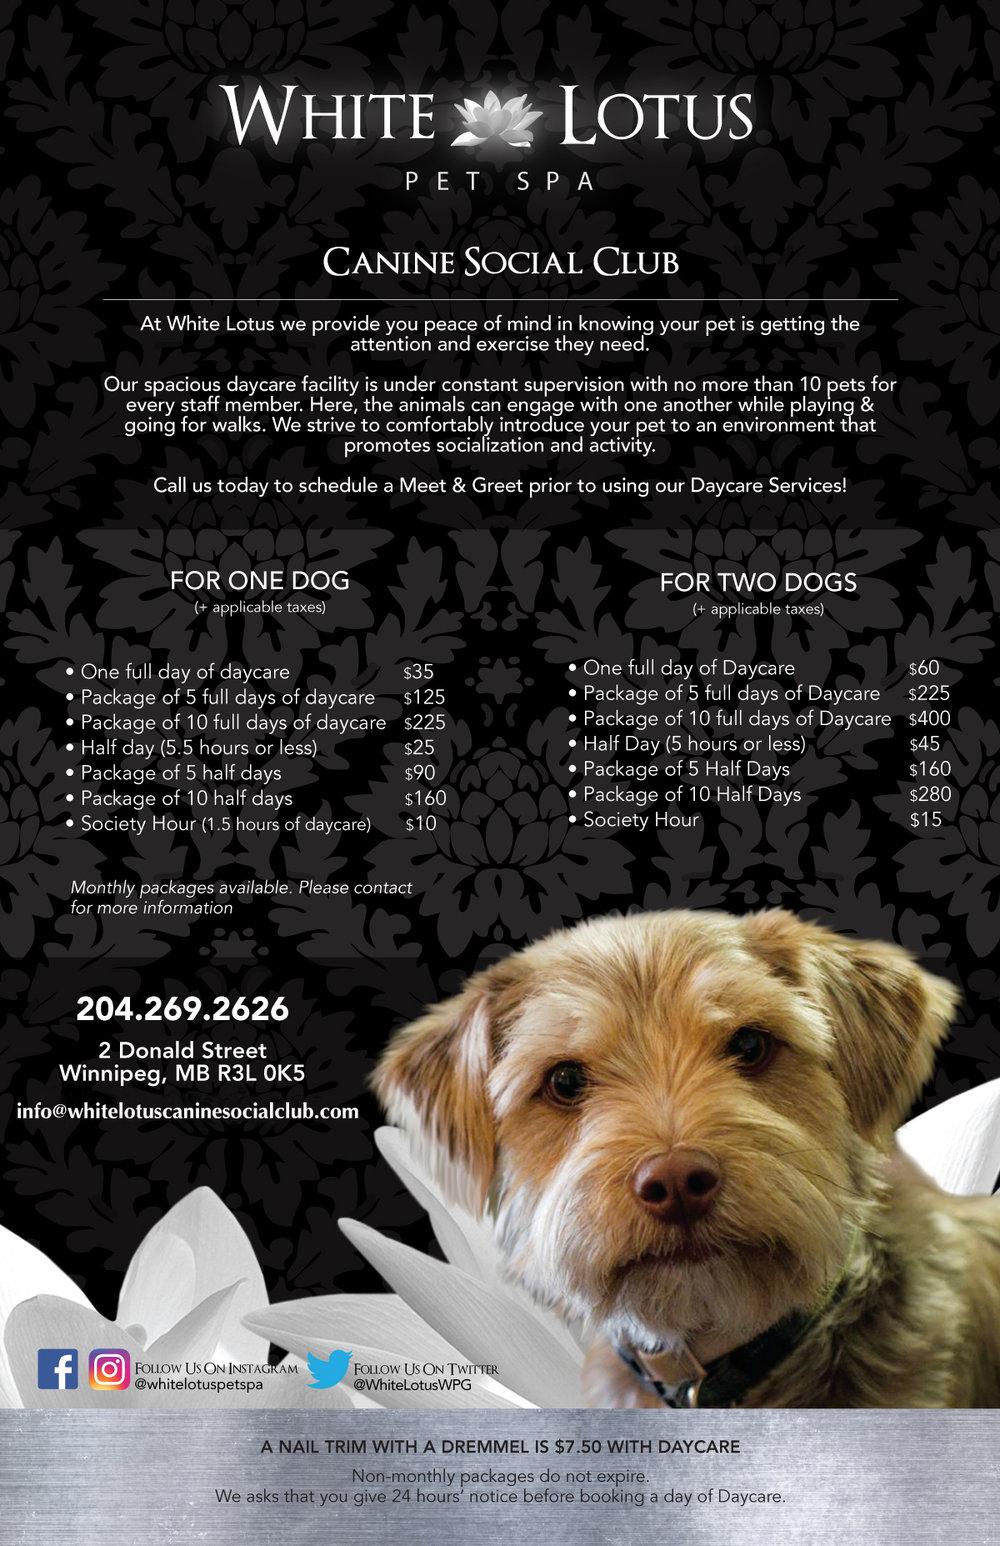 CanineSocialClub2019.jpg